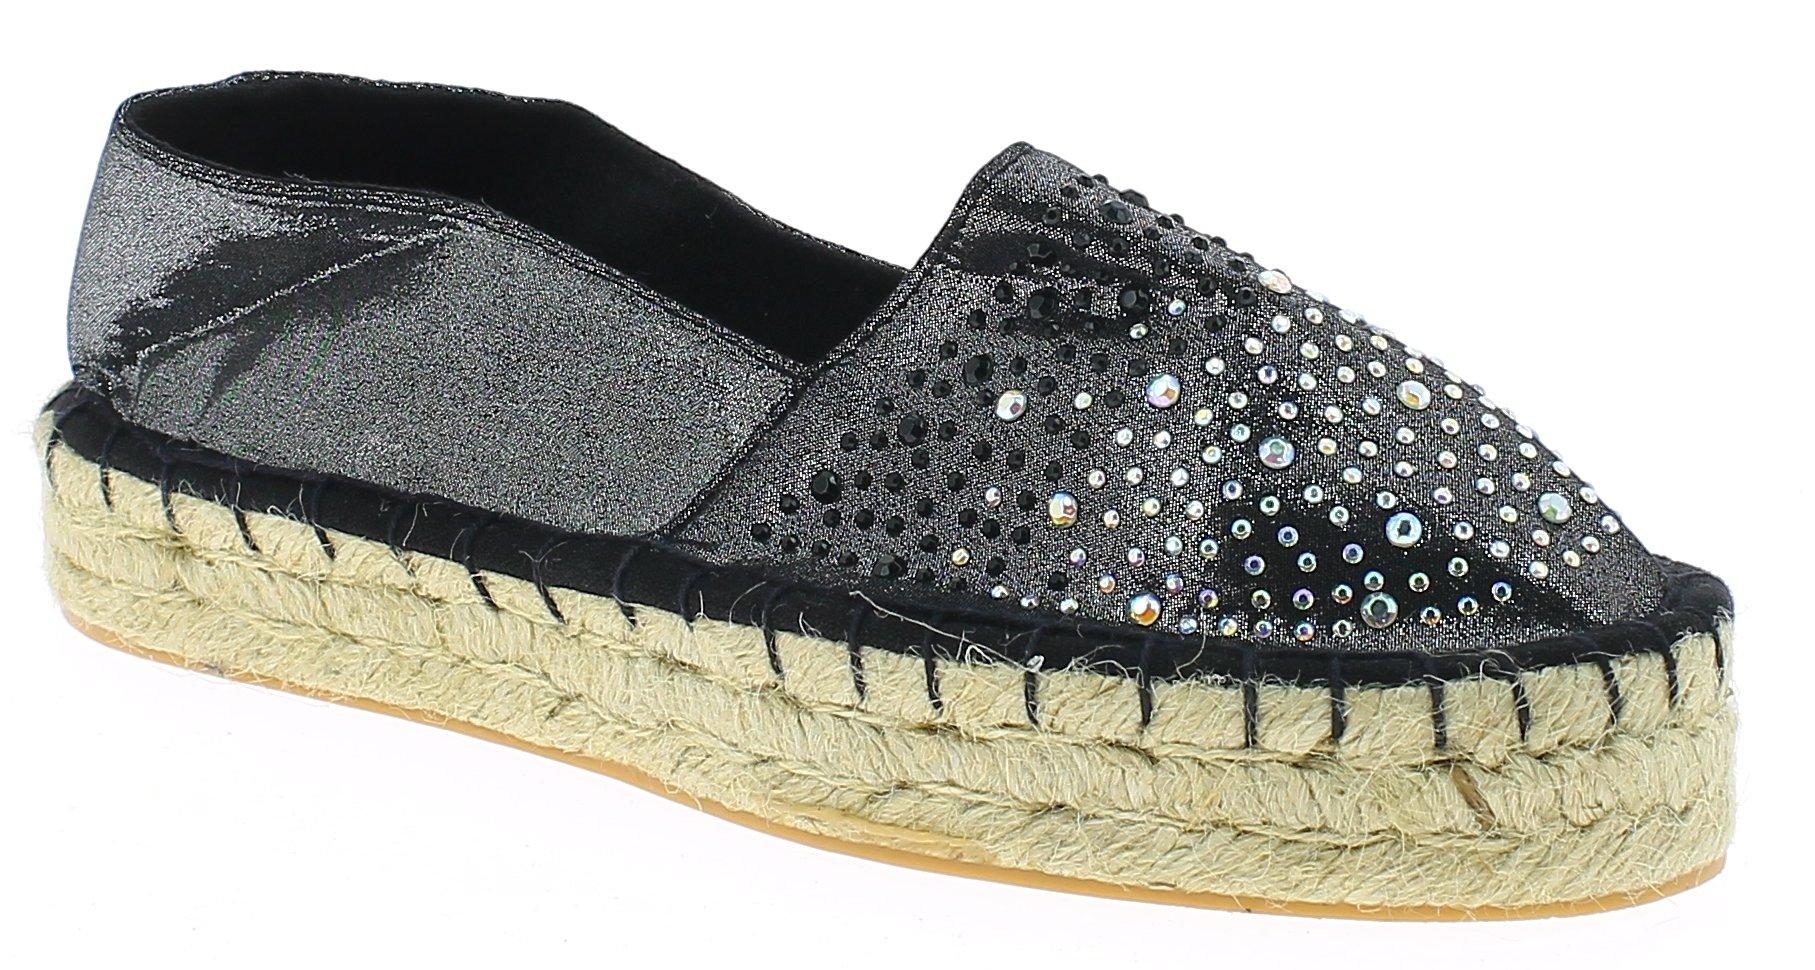 POMPEA Γυναικείο Casual LITA 215 Μαύρο - IqShoes - LITO 215 NERO-black-38/1/15/1 παπούτσια  προσφορεσ